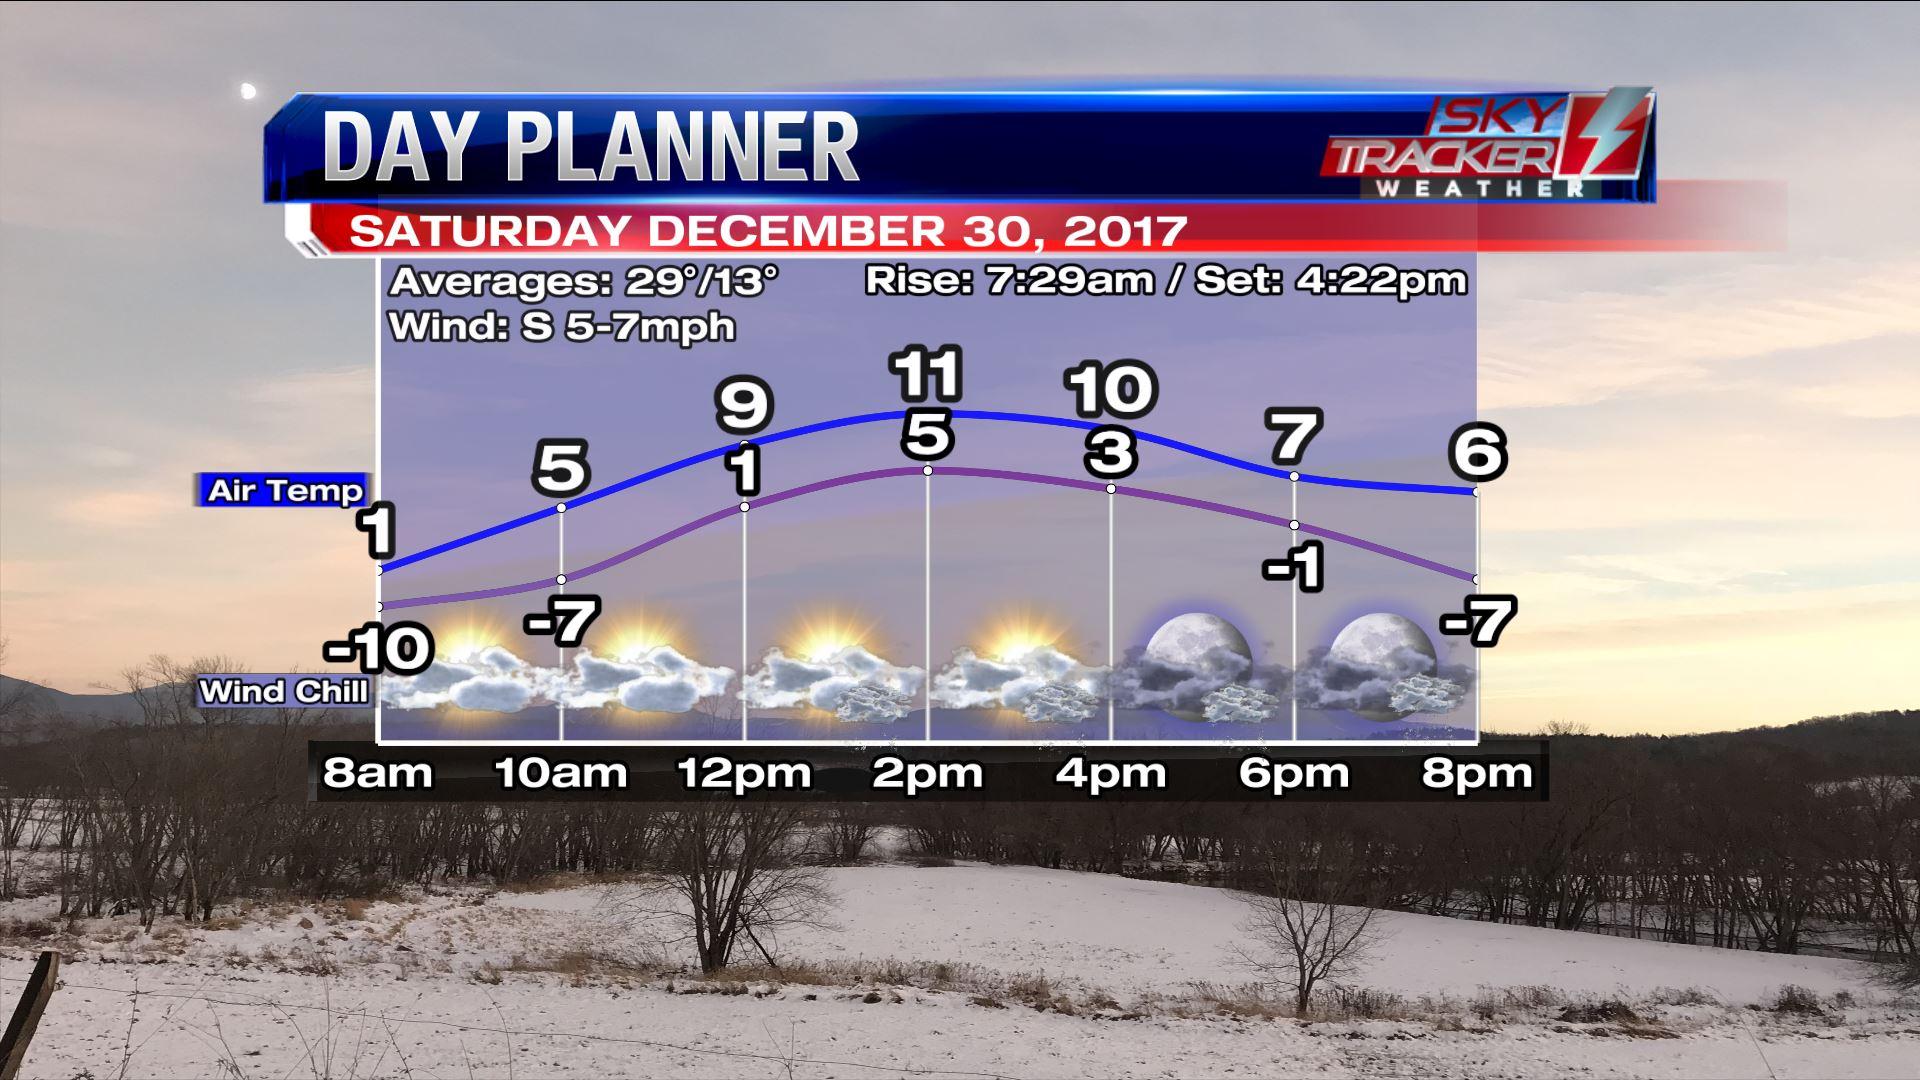 Planner for Saturday December 30 2017